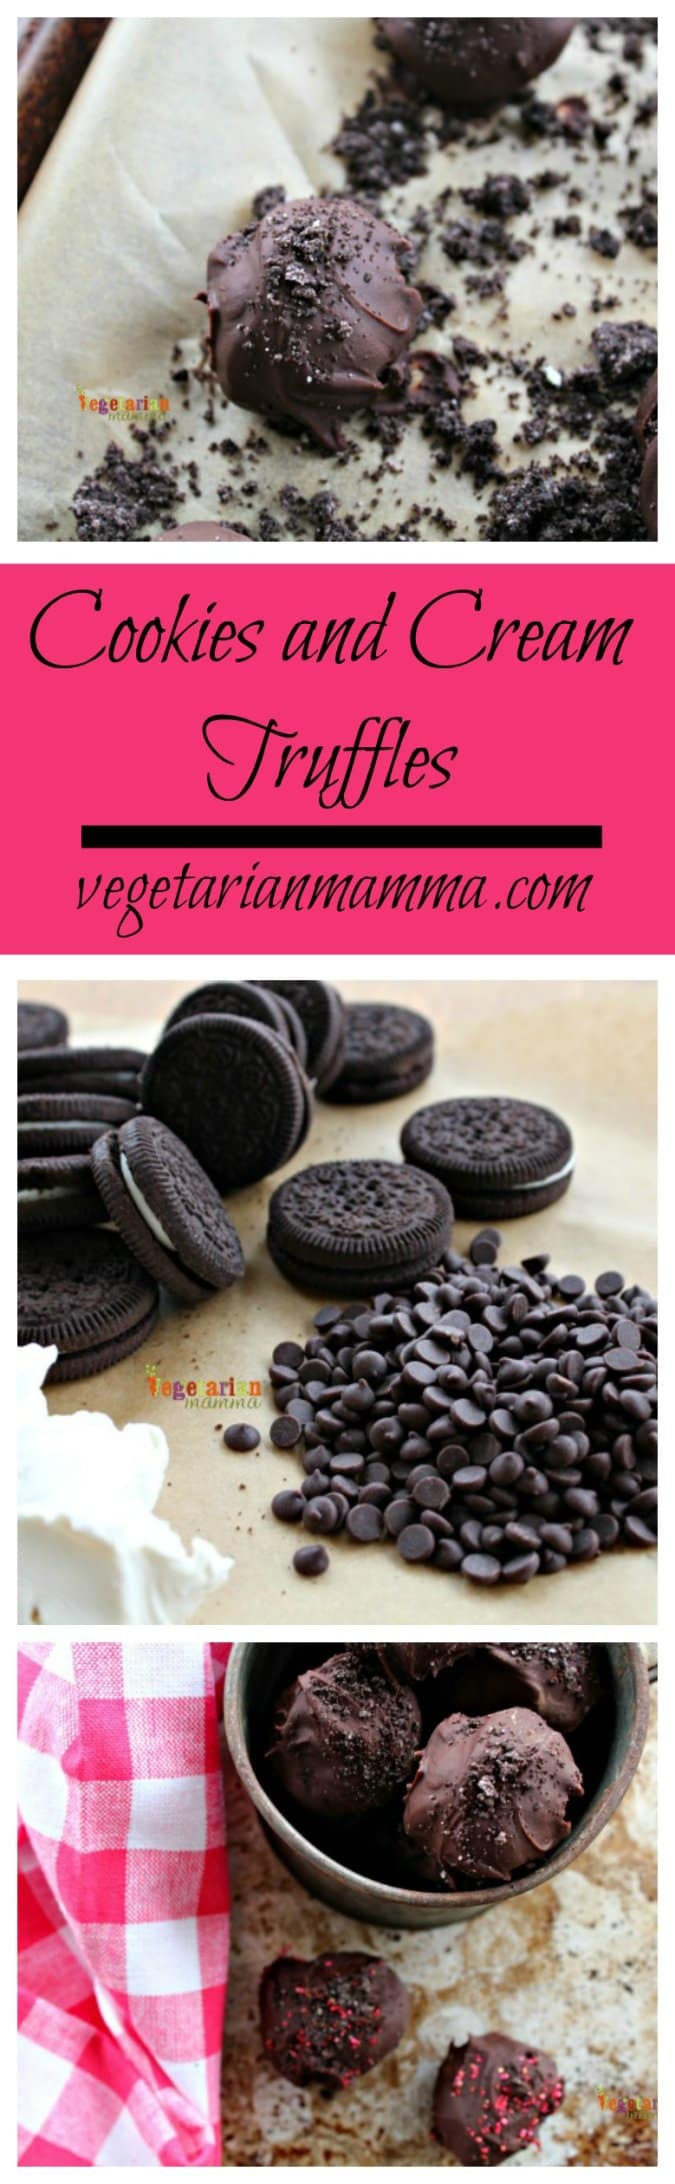 Cookies and Cream Truffles @vegetarianmamma.com #truffle #dairyfree #glutenfree #nutfree #chocolate #dessert #valentines